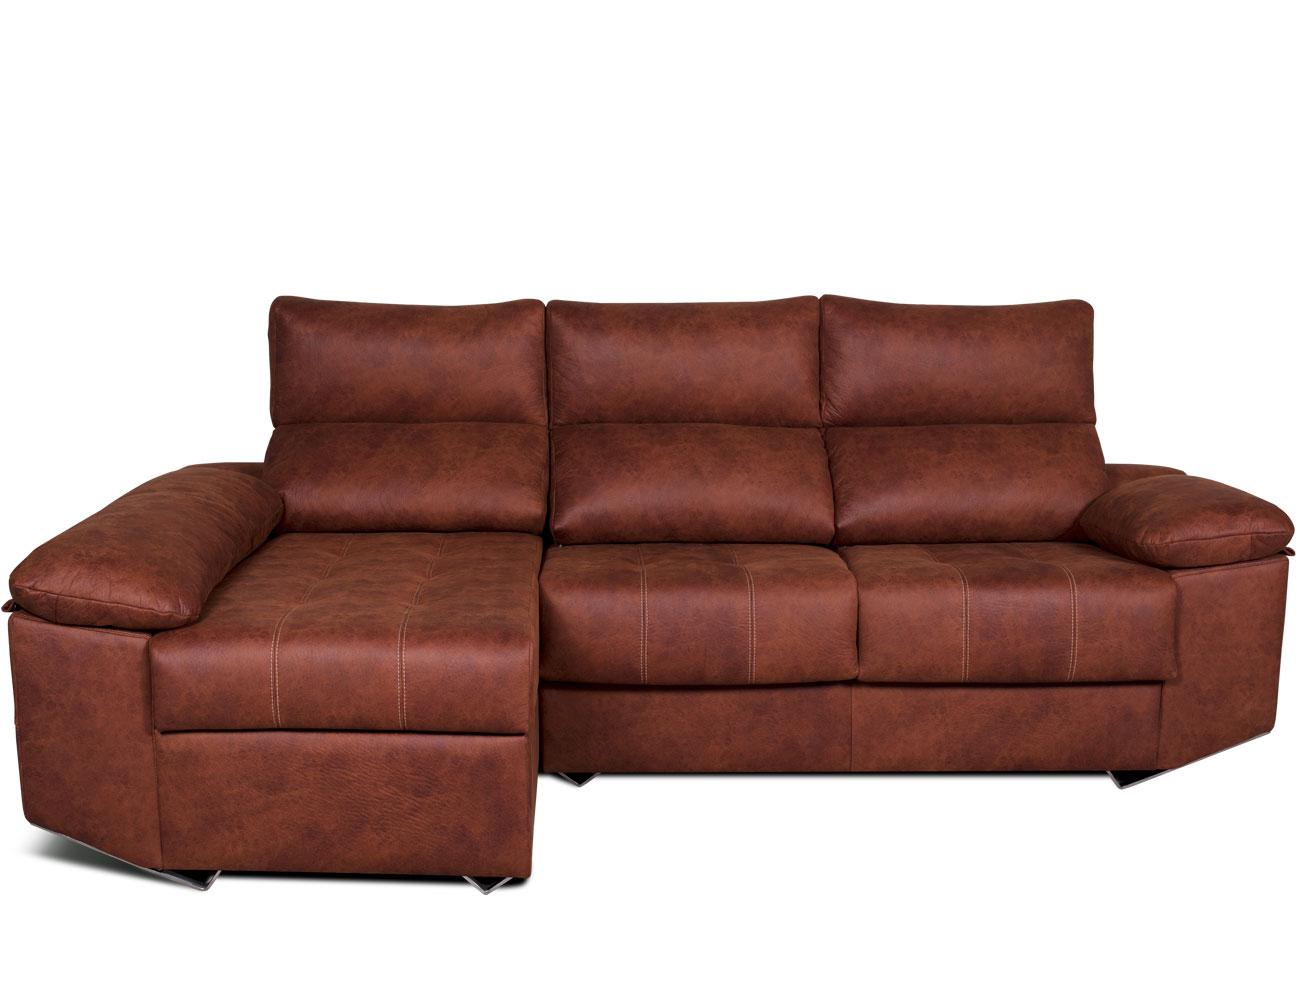 Sofa chaiselongue moderno patas forma tejido anti manchas 25